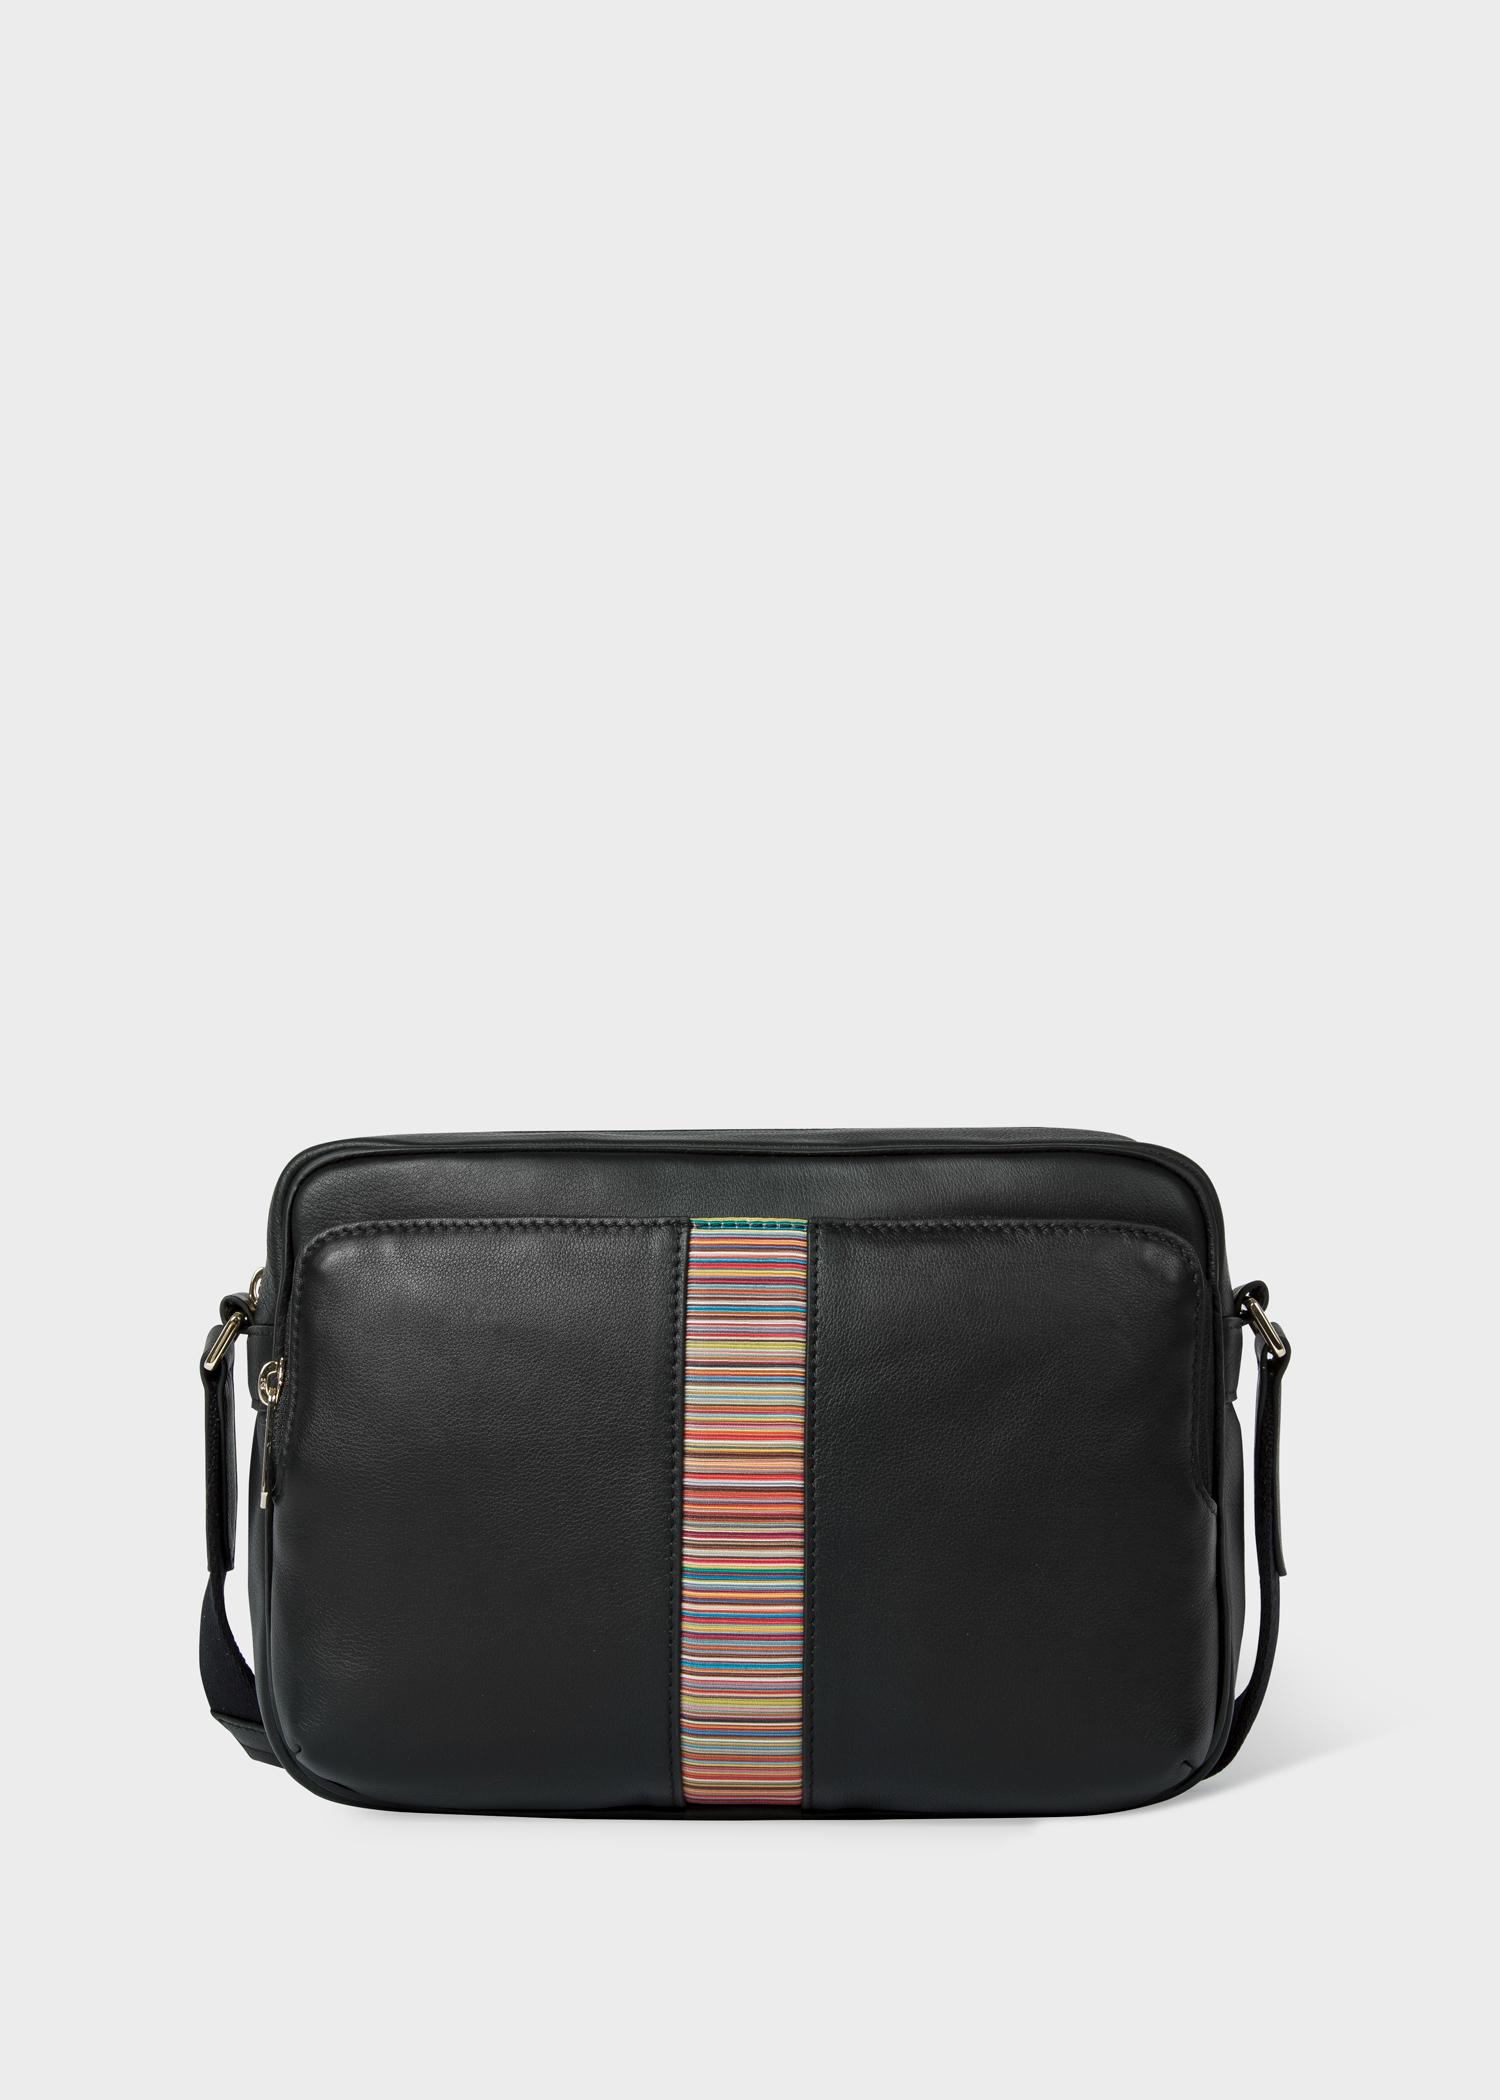 Men's Black Leather 'Signature Stripe' Cross-Body Bag